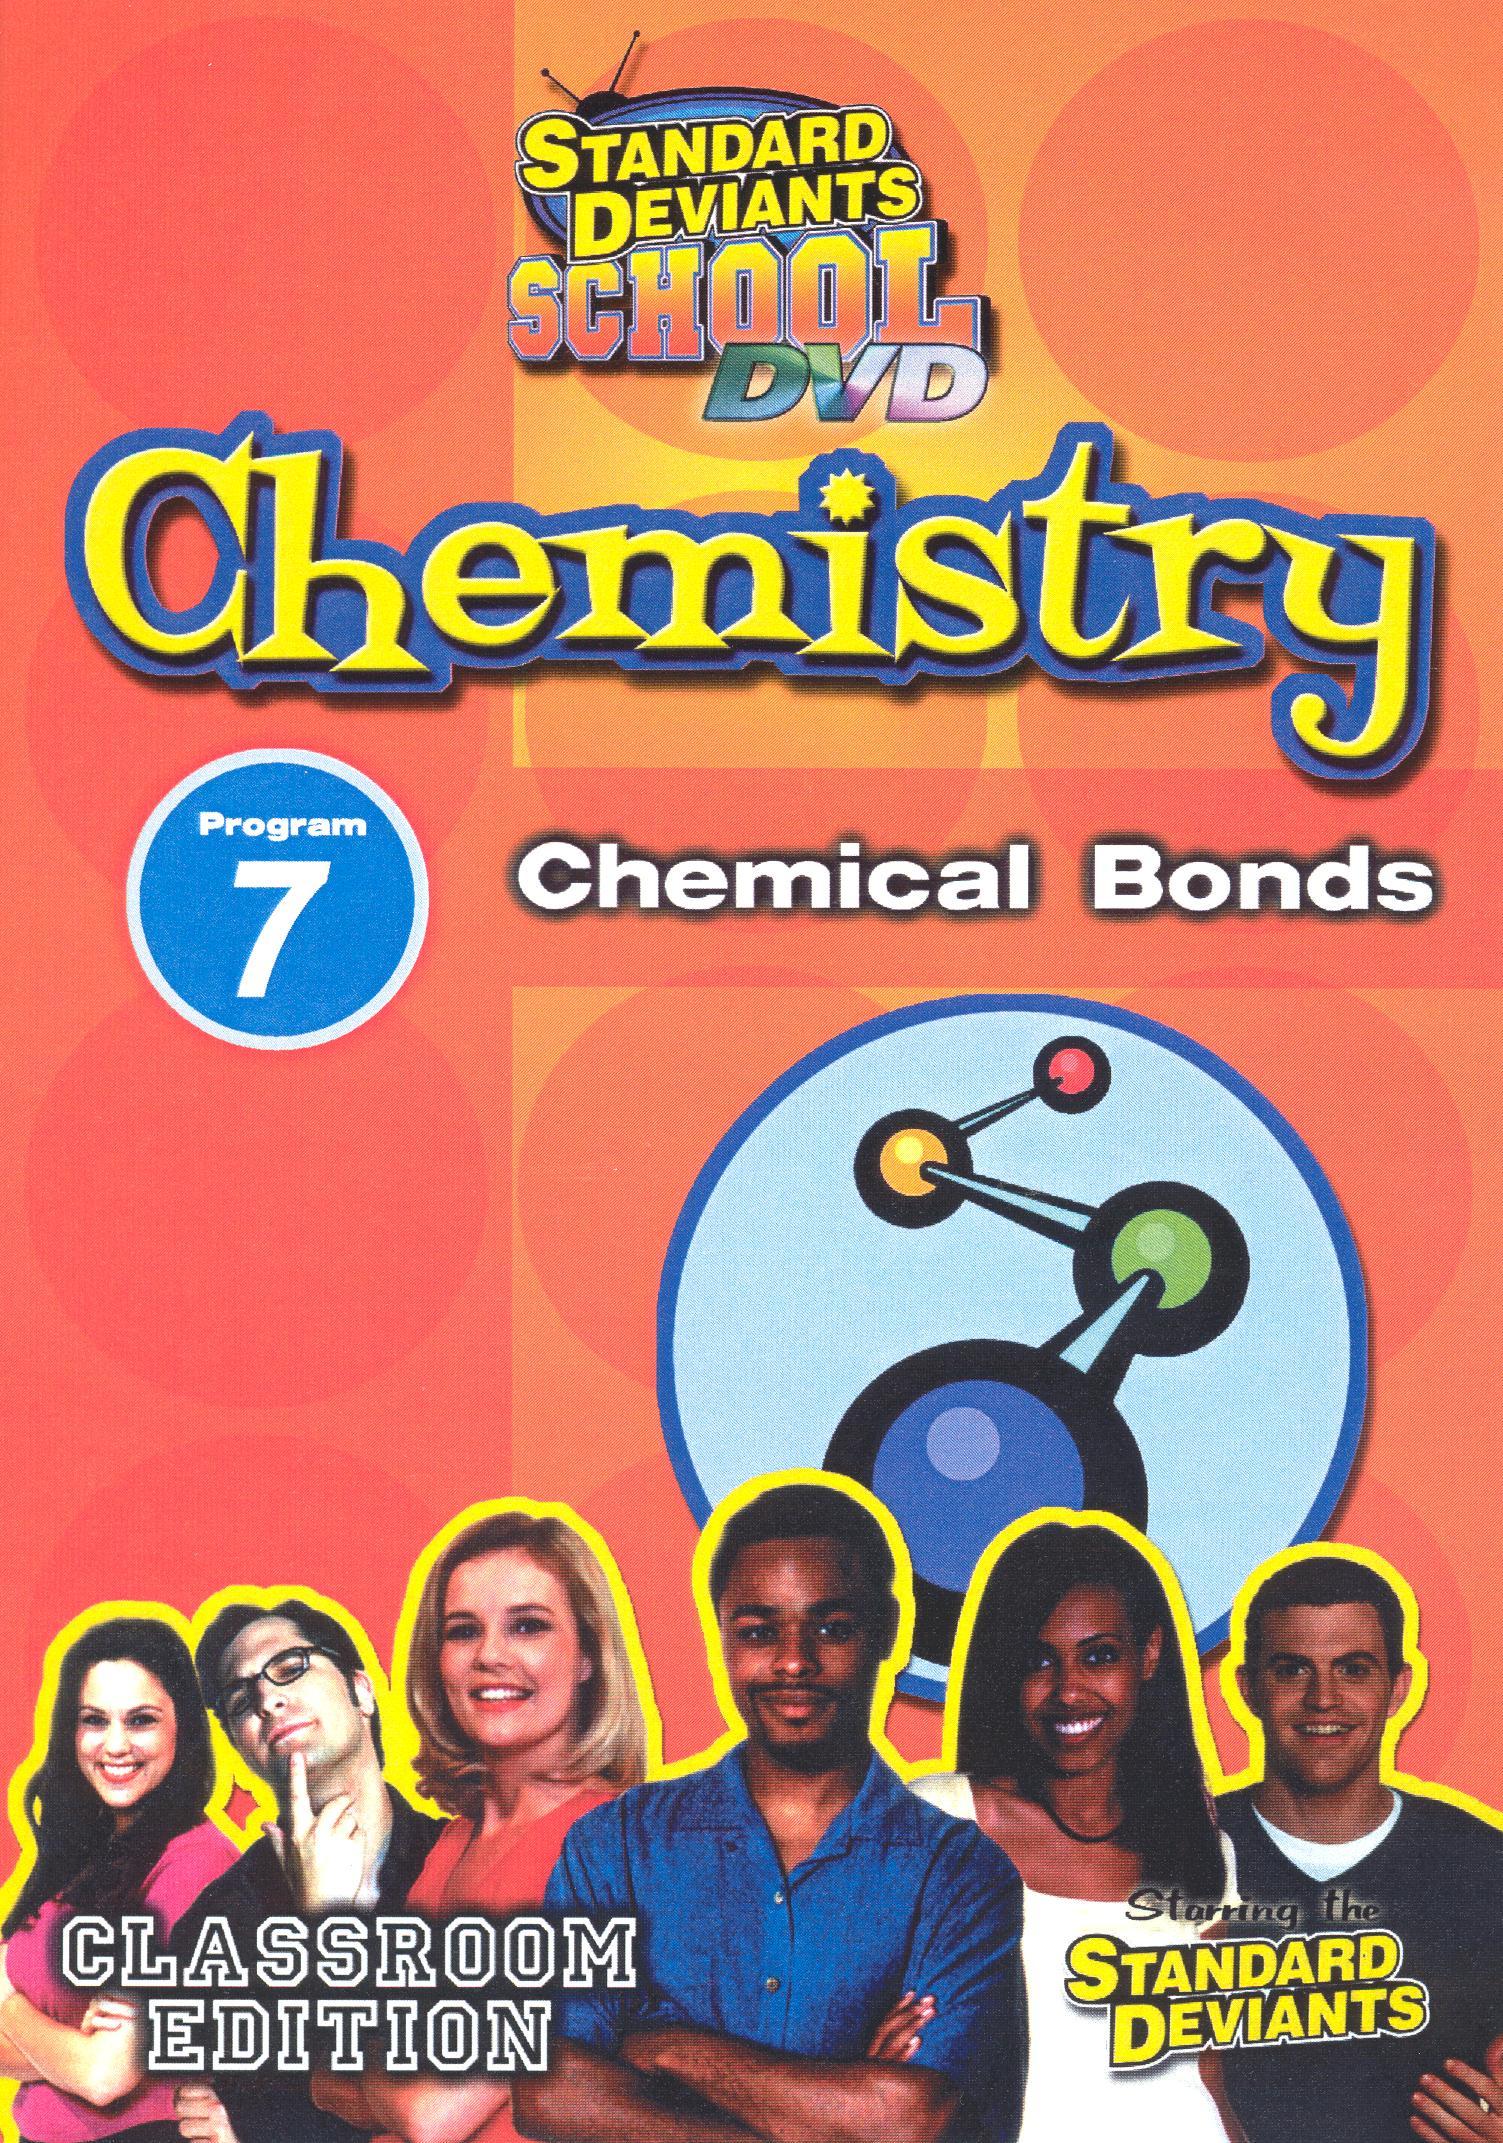 Standard Deviants School: Chemistry, Program 7